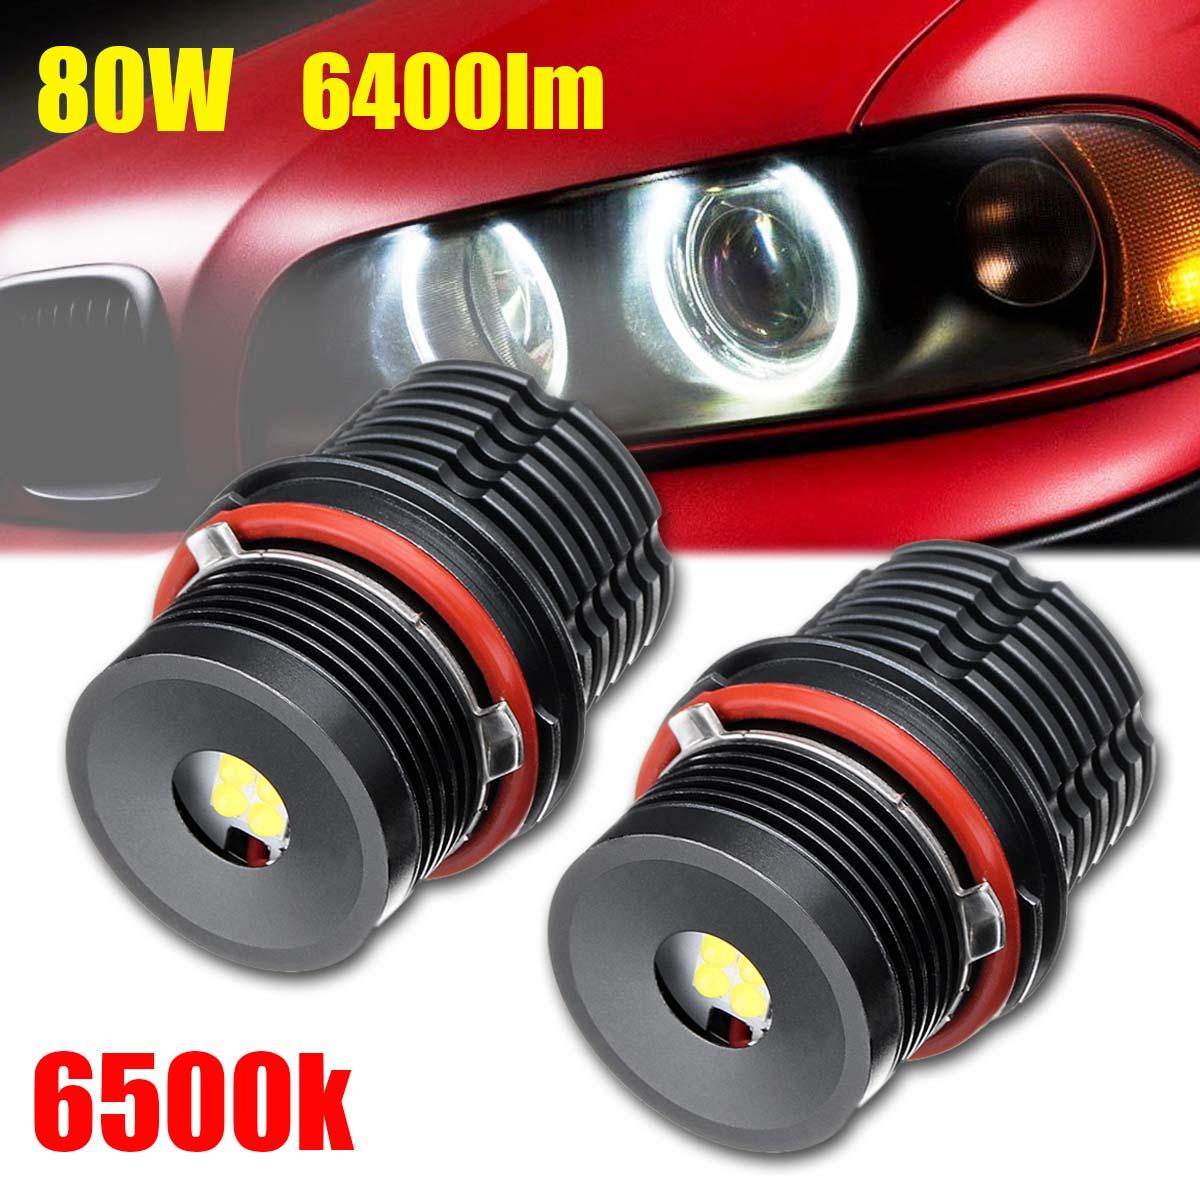 New 2pcs 80W Light Bulbs For BMW E39 E53 E63 Angel Eyes Error Free LED Halo Ring Durable Car Sight Head Light Accessories